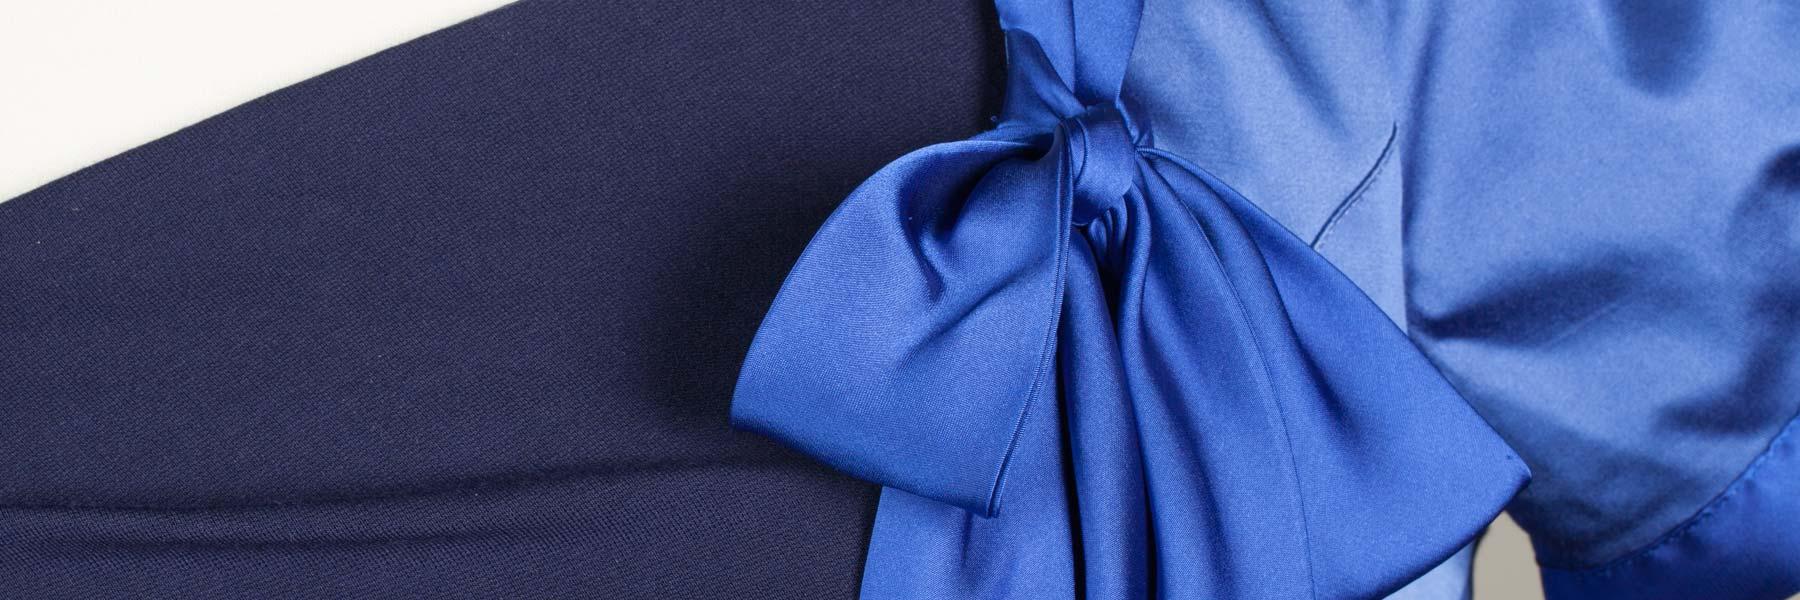 Bespoke Textiles blue pussy bow dress